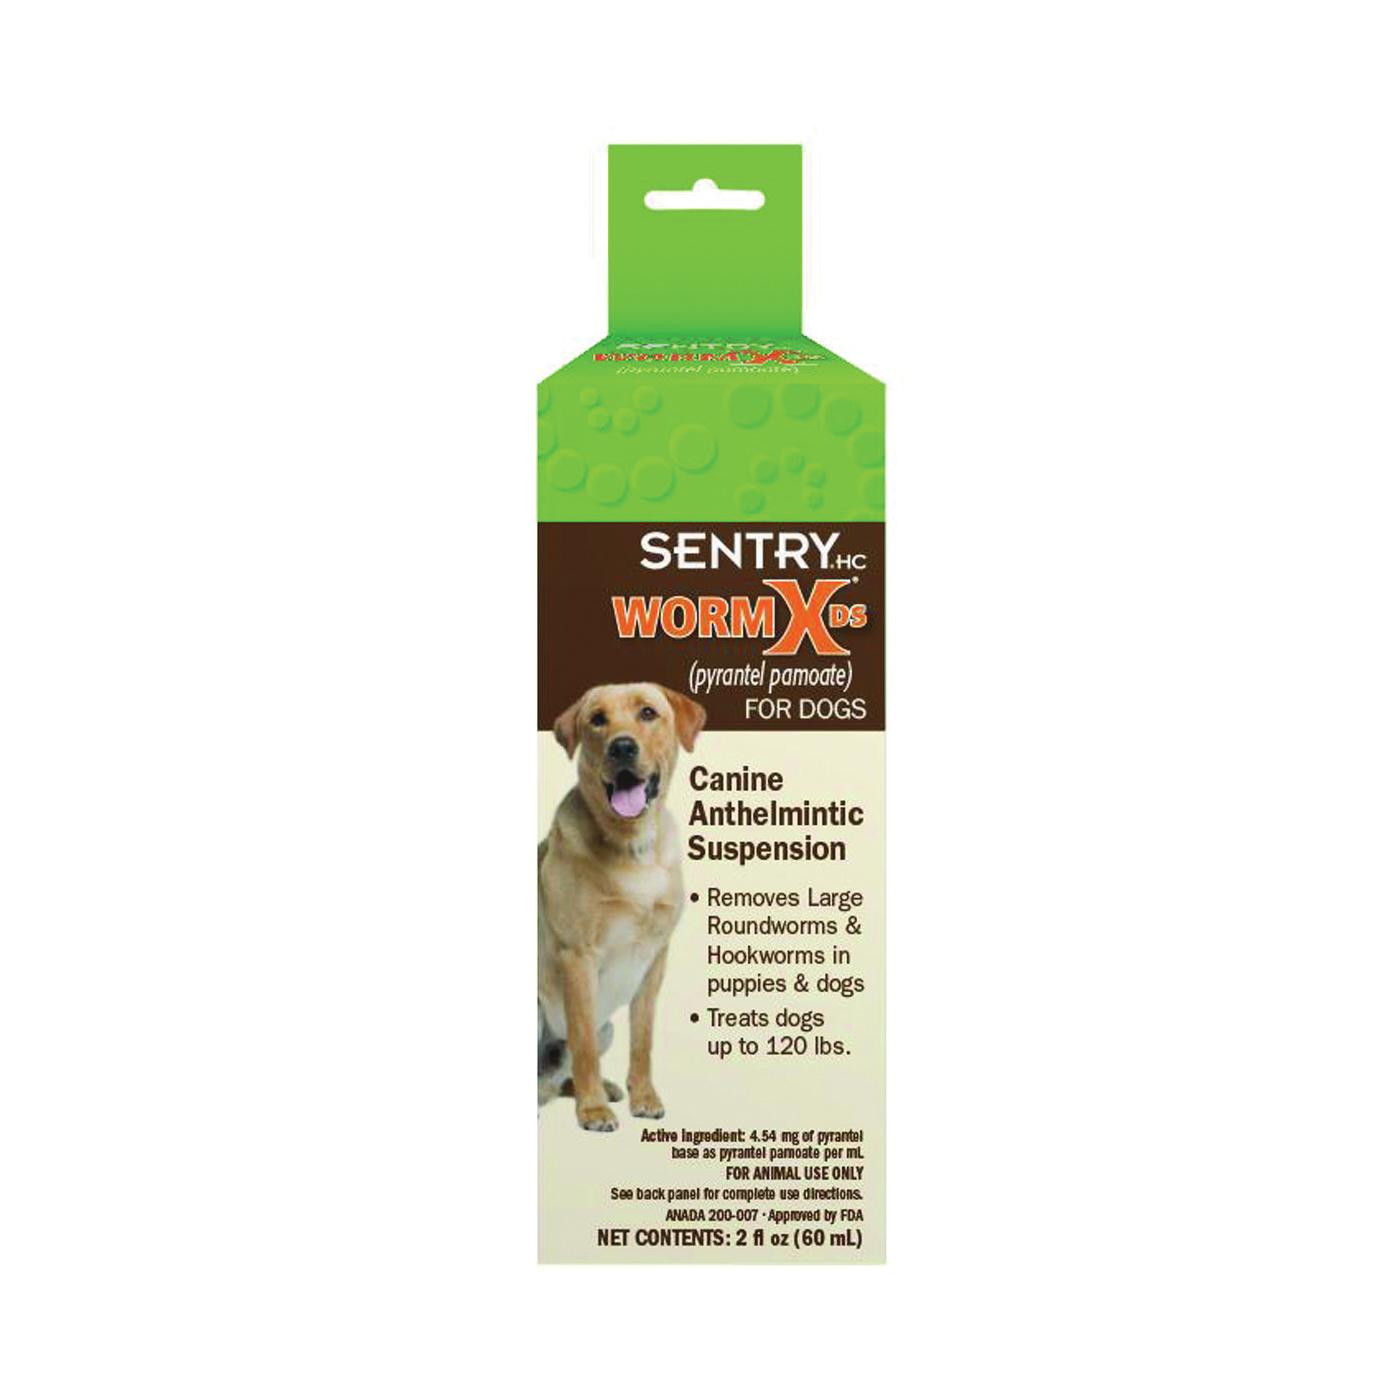 Sentry 17500